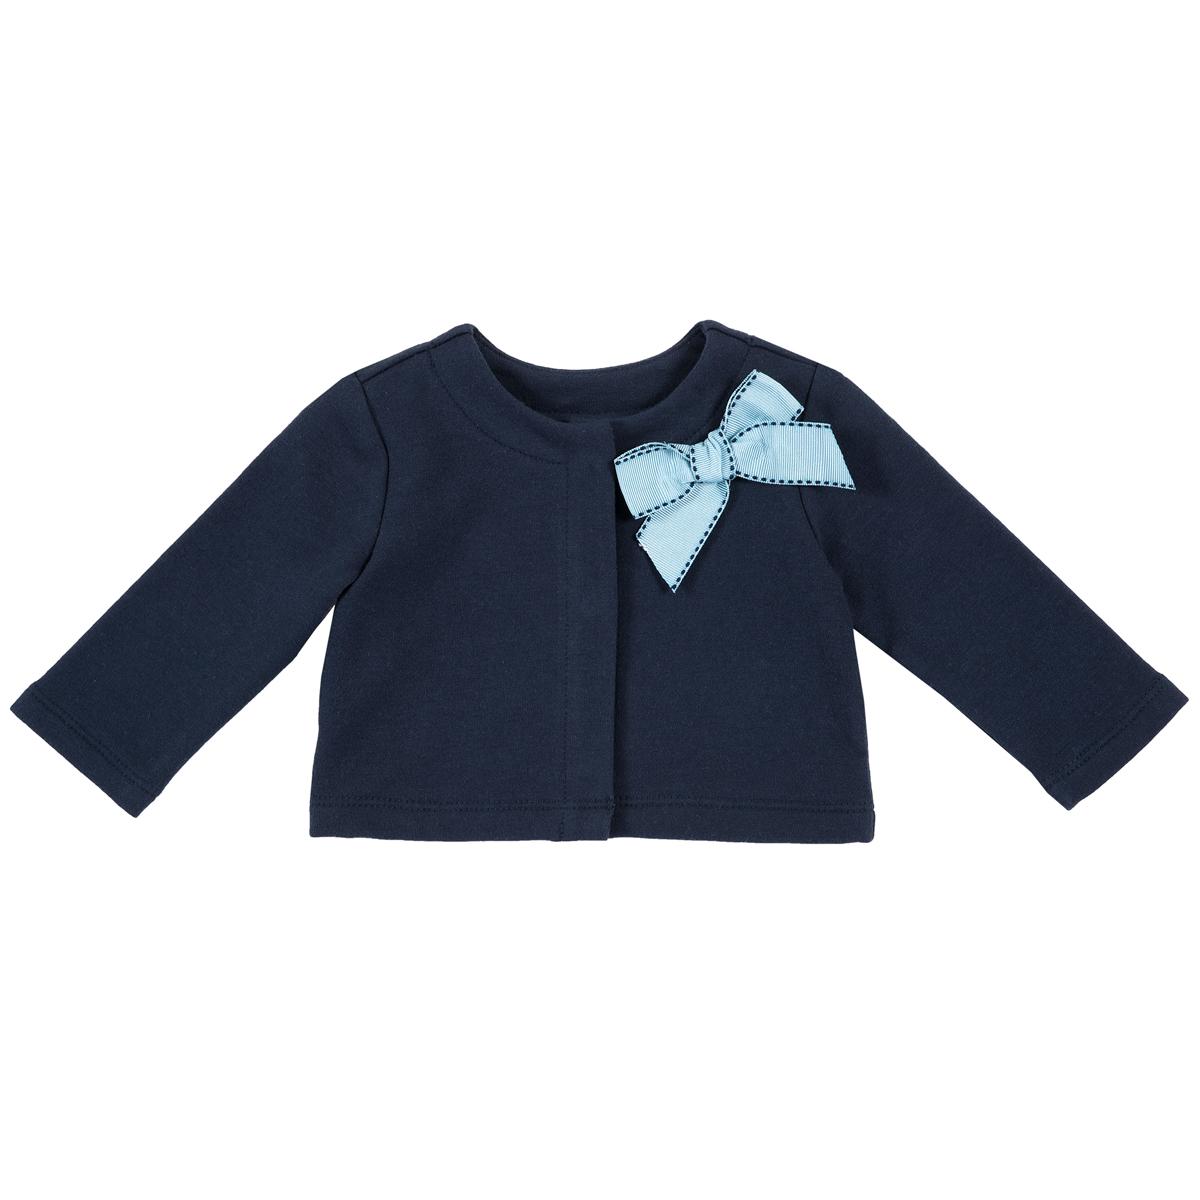 Cardigan copii Chicco, bleumarin cu fundita decorativa, 96945 din categoria Cardigan copii